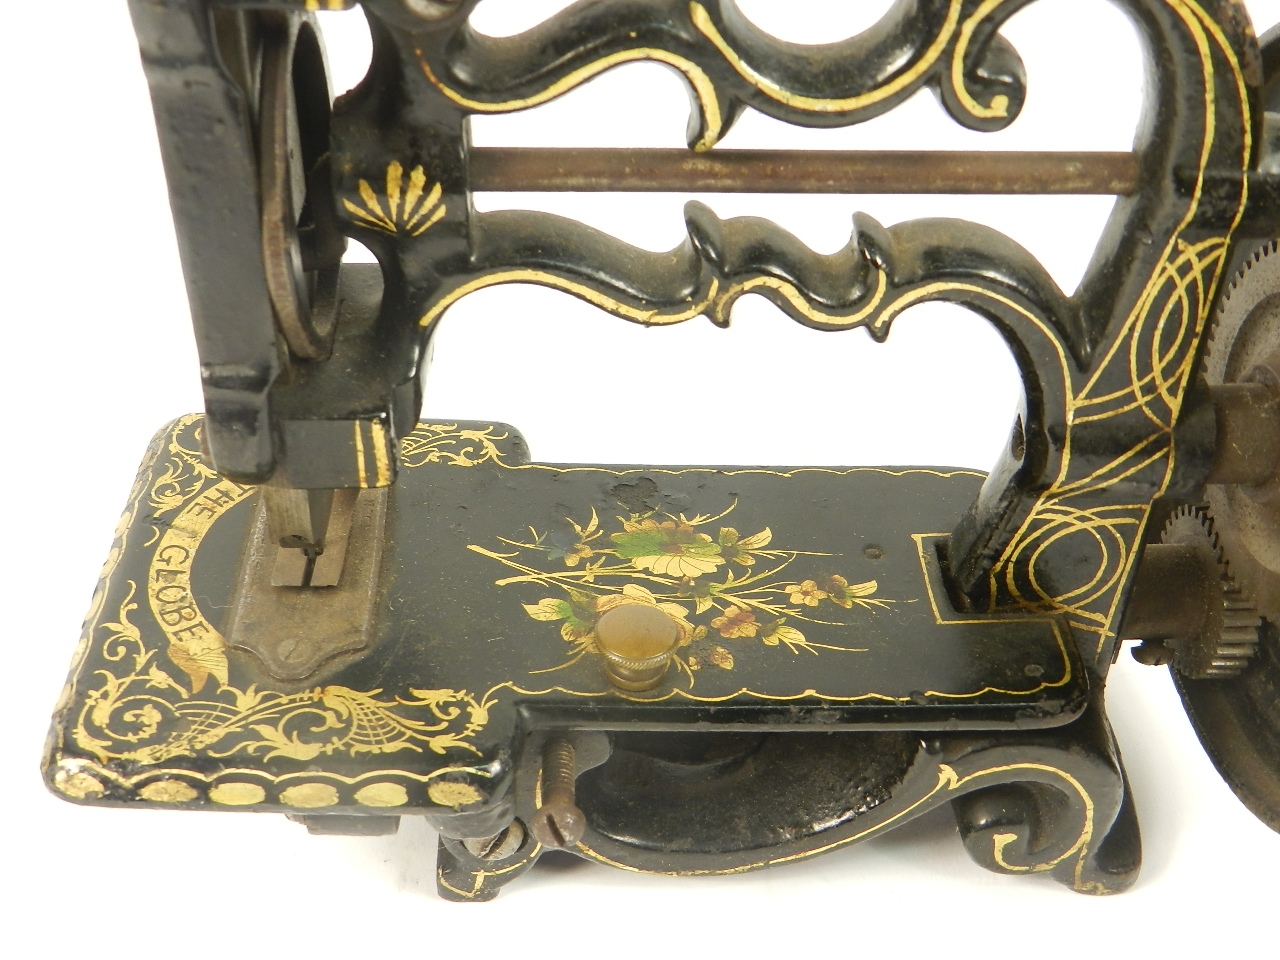 Imagen THE GLOBE JAMES G. WEIR - CHARLES RAYMOND AÑO 1869 35594